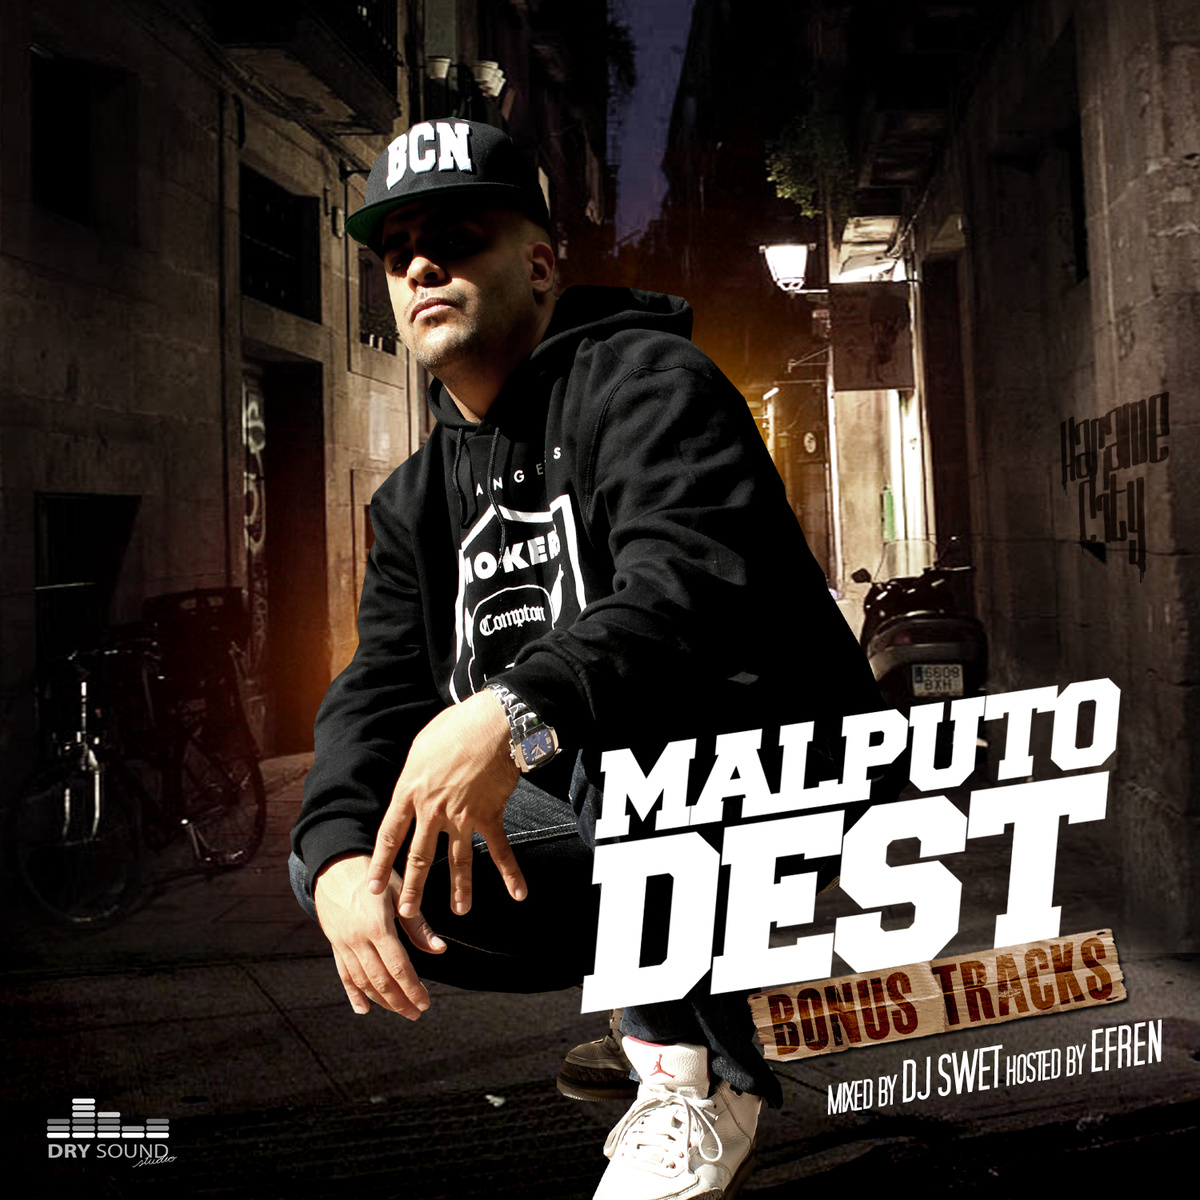 Malputo_dest_-_bonus_tracks_mixtape